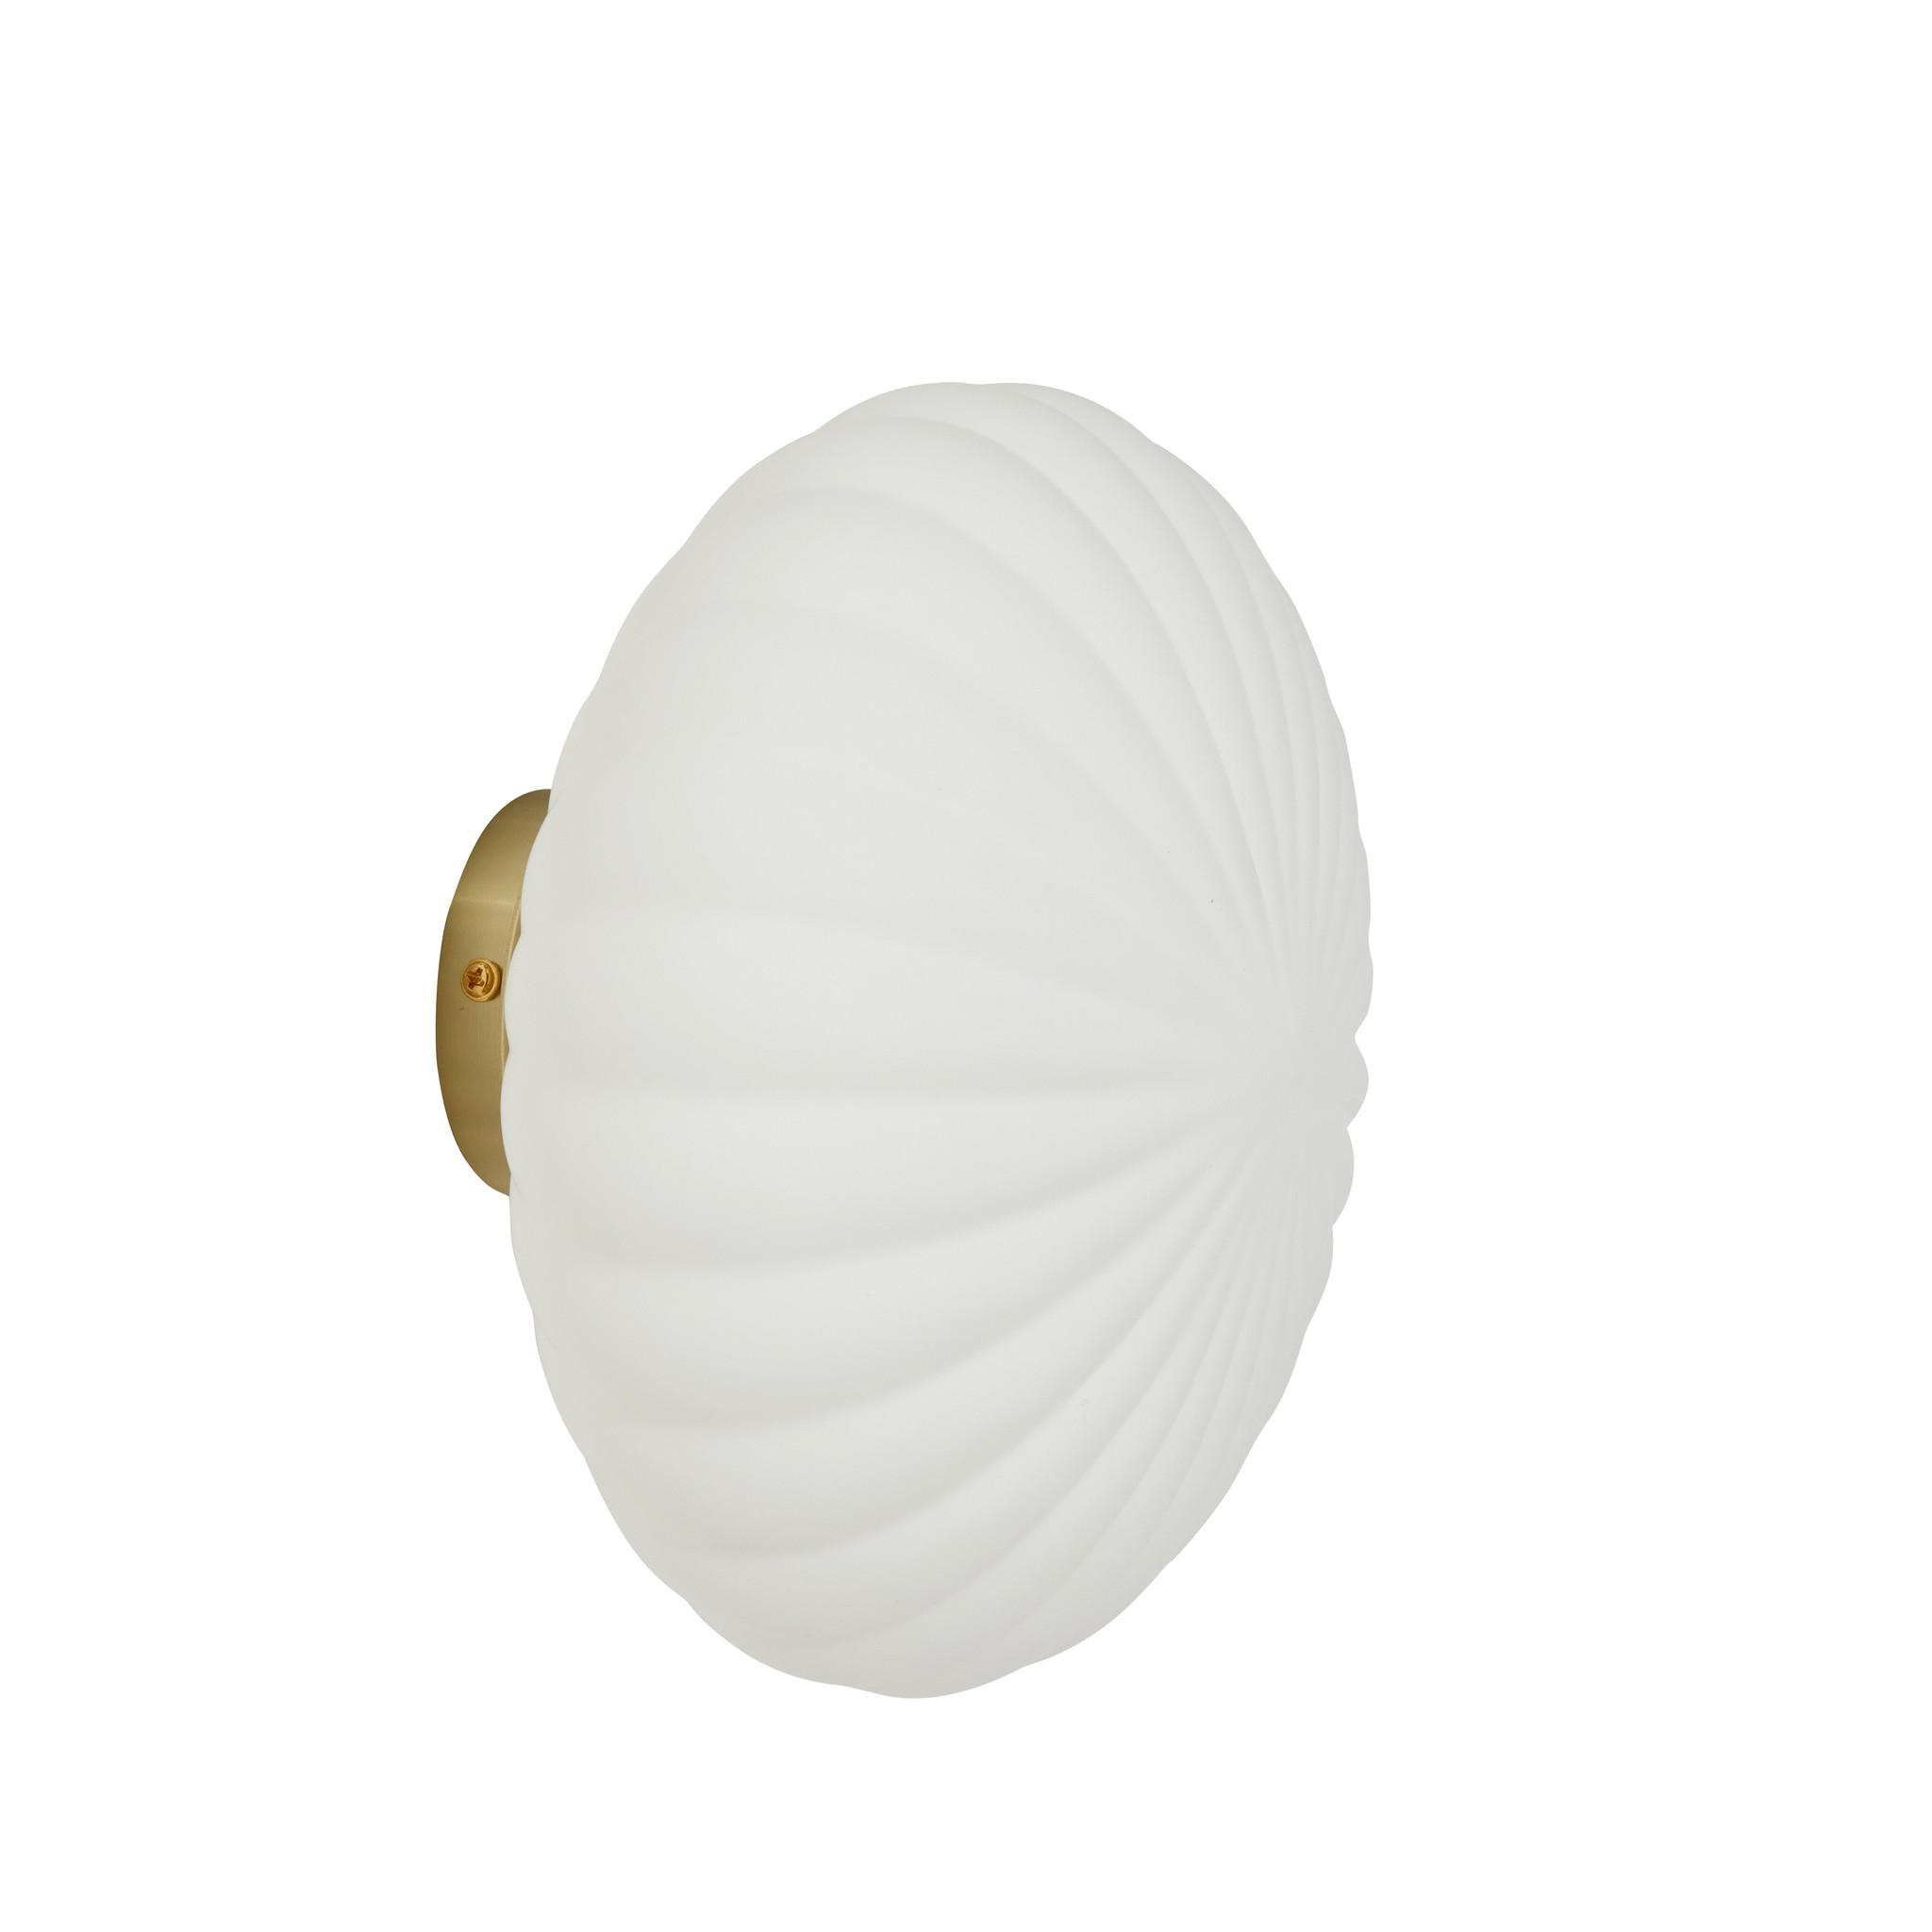 Hubsch Wandlamp metaal/glas, messing/opaal ø25cm-991312-5712772112847